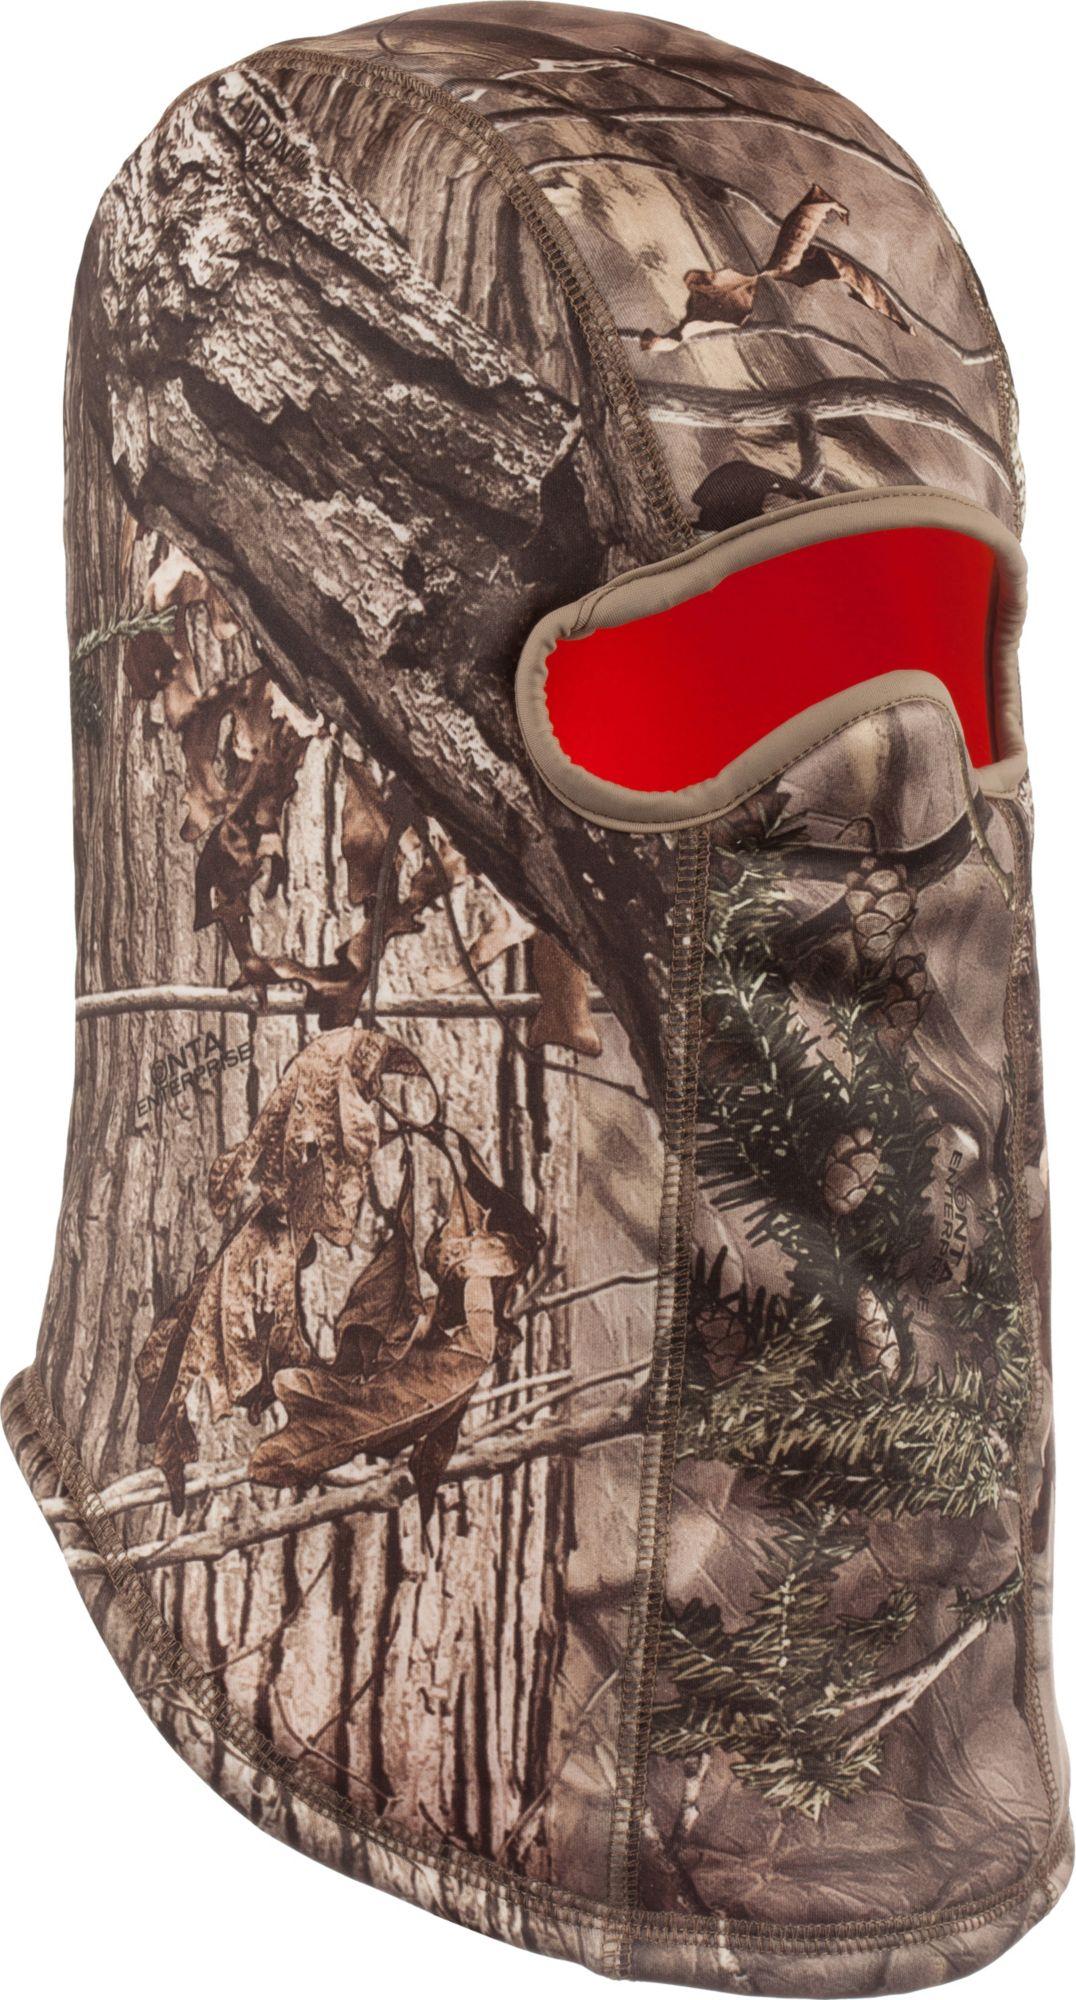 Huntworth Men's Hunting Camo/Blaze Reversible Balaclava, Brown thumbnail